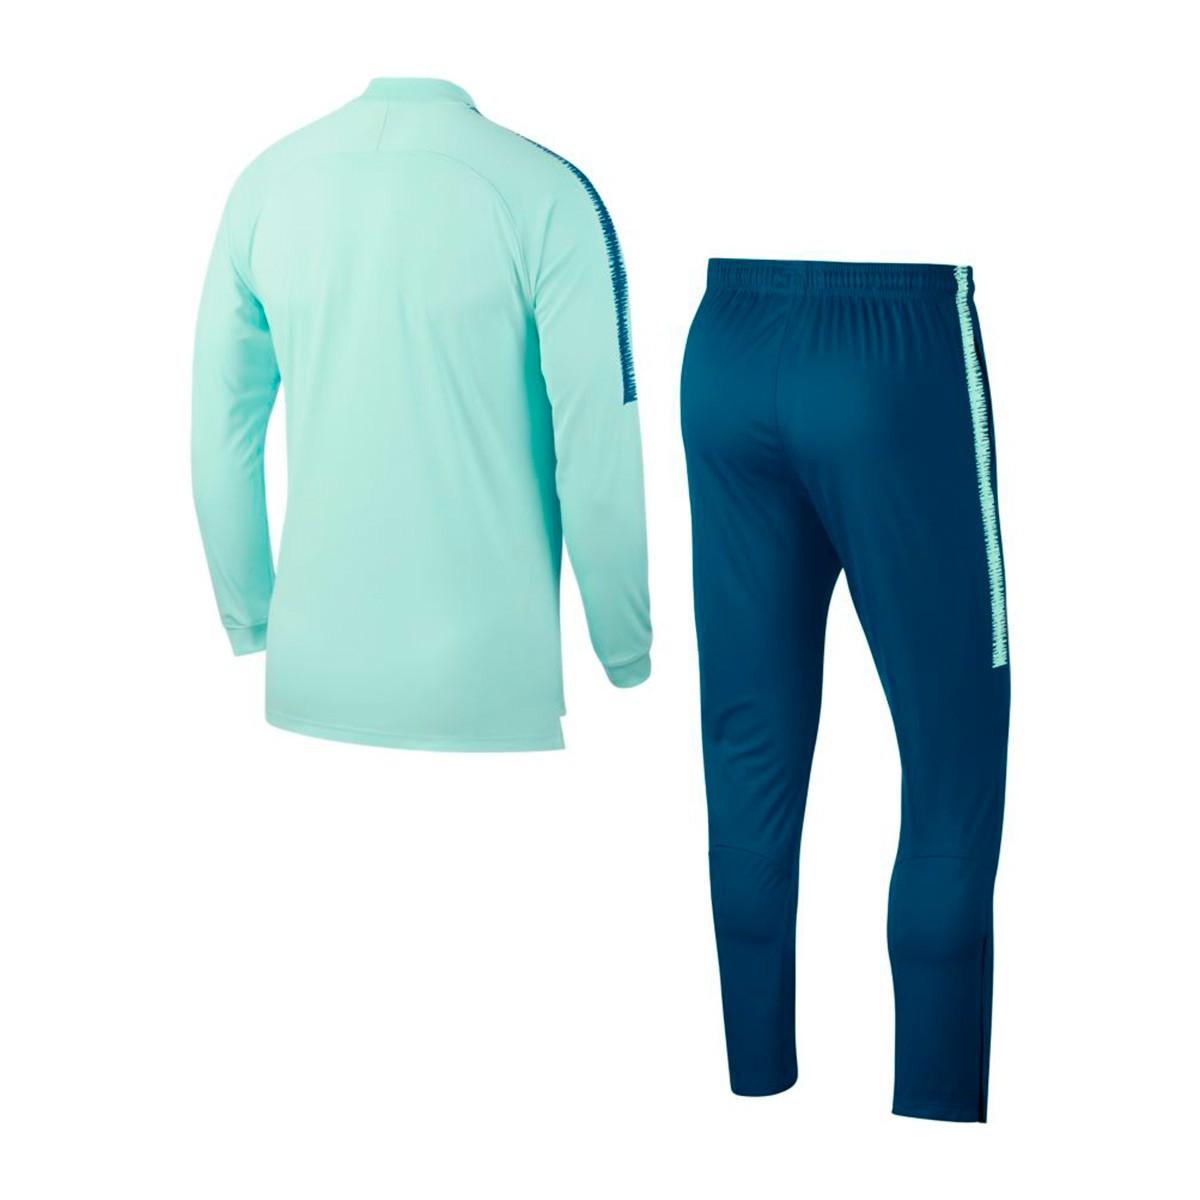 57bb1e23590d7 Survêtement Nike Atlético de Madrid Squad 2018-2019 Igloo-Green abyss -  Boutique de football Fútbol Emotion